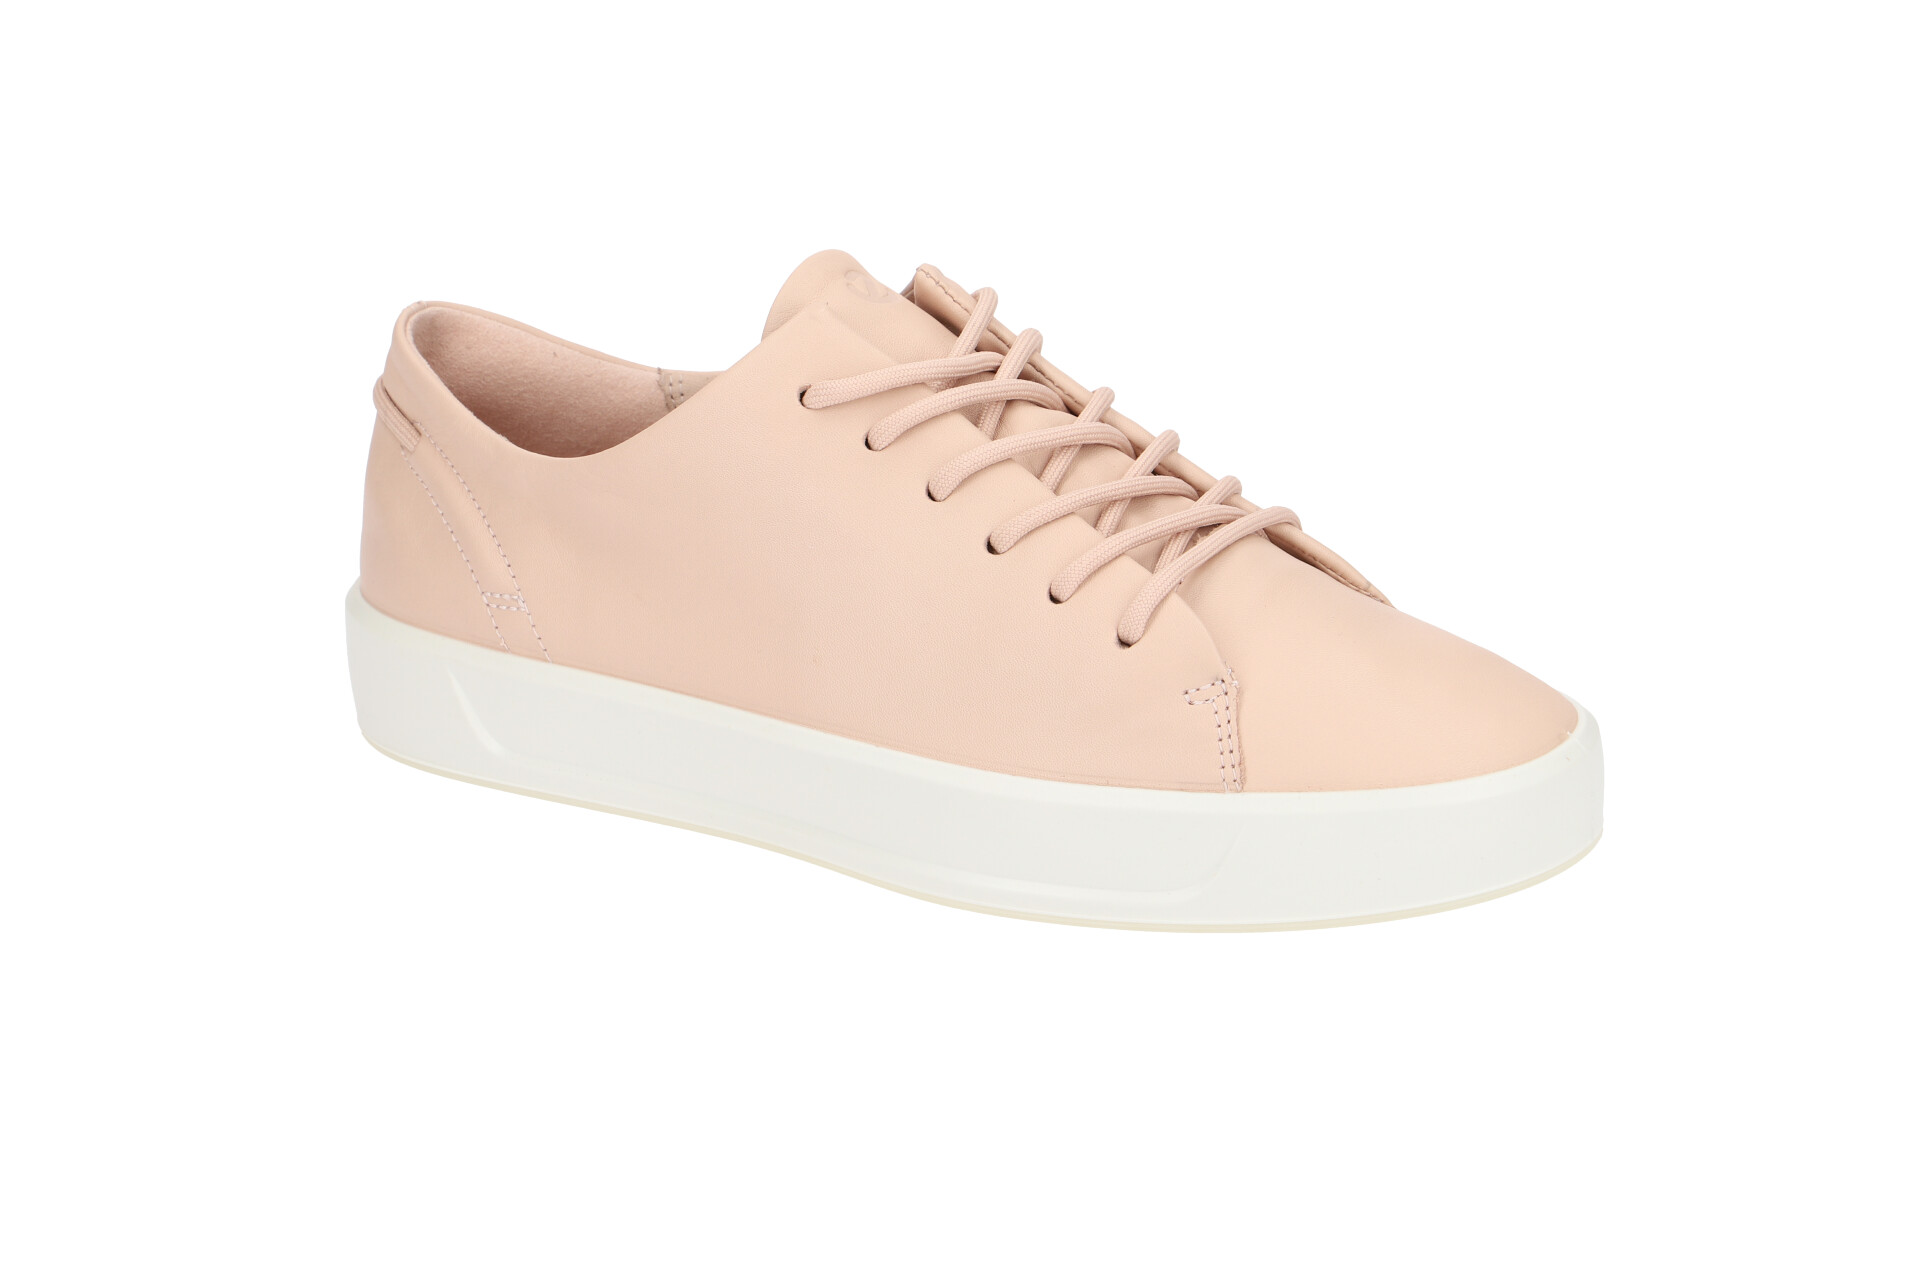 6c3d1fa2d7cba2 Soft Strauch Shop Rosa 8 Schuhhaus Schuhe Ecco Sneakers 0wOk8Pn